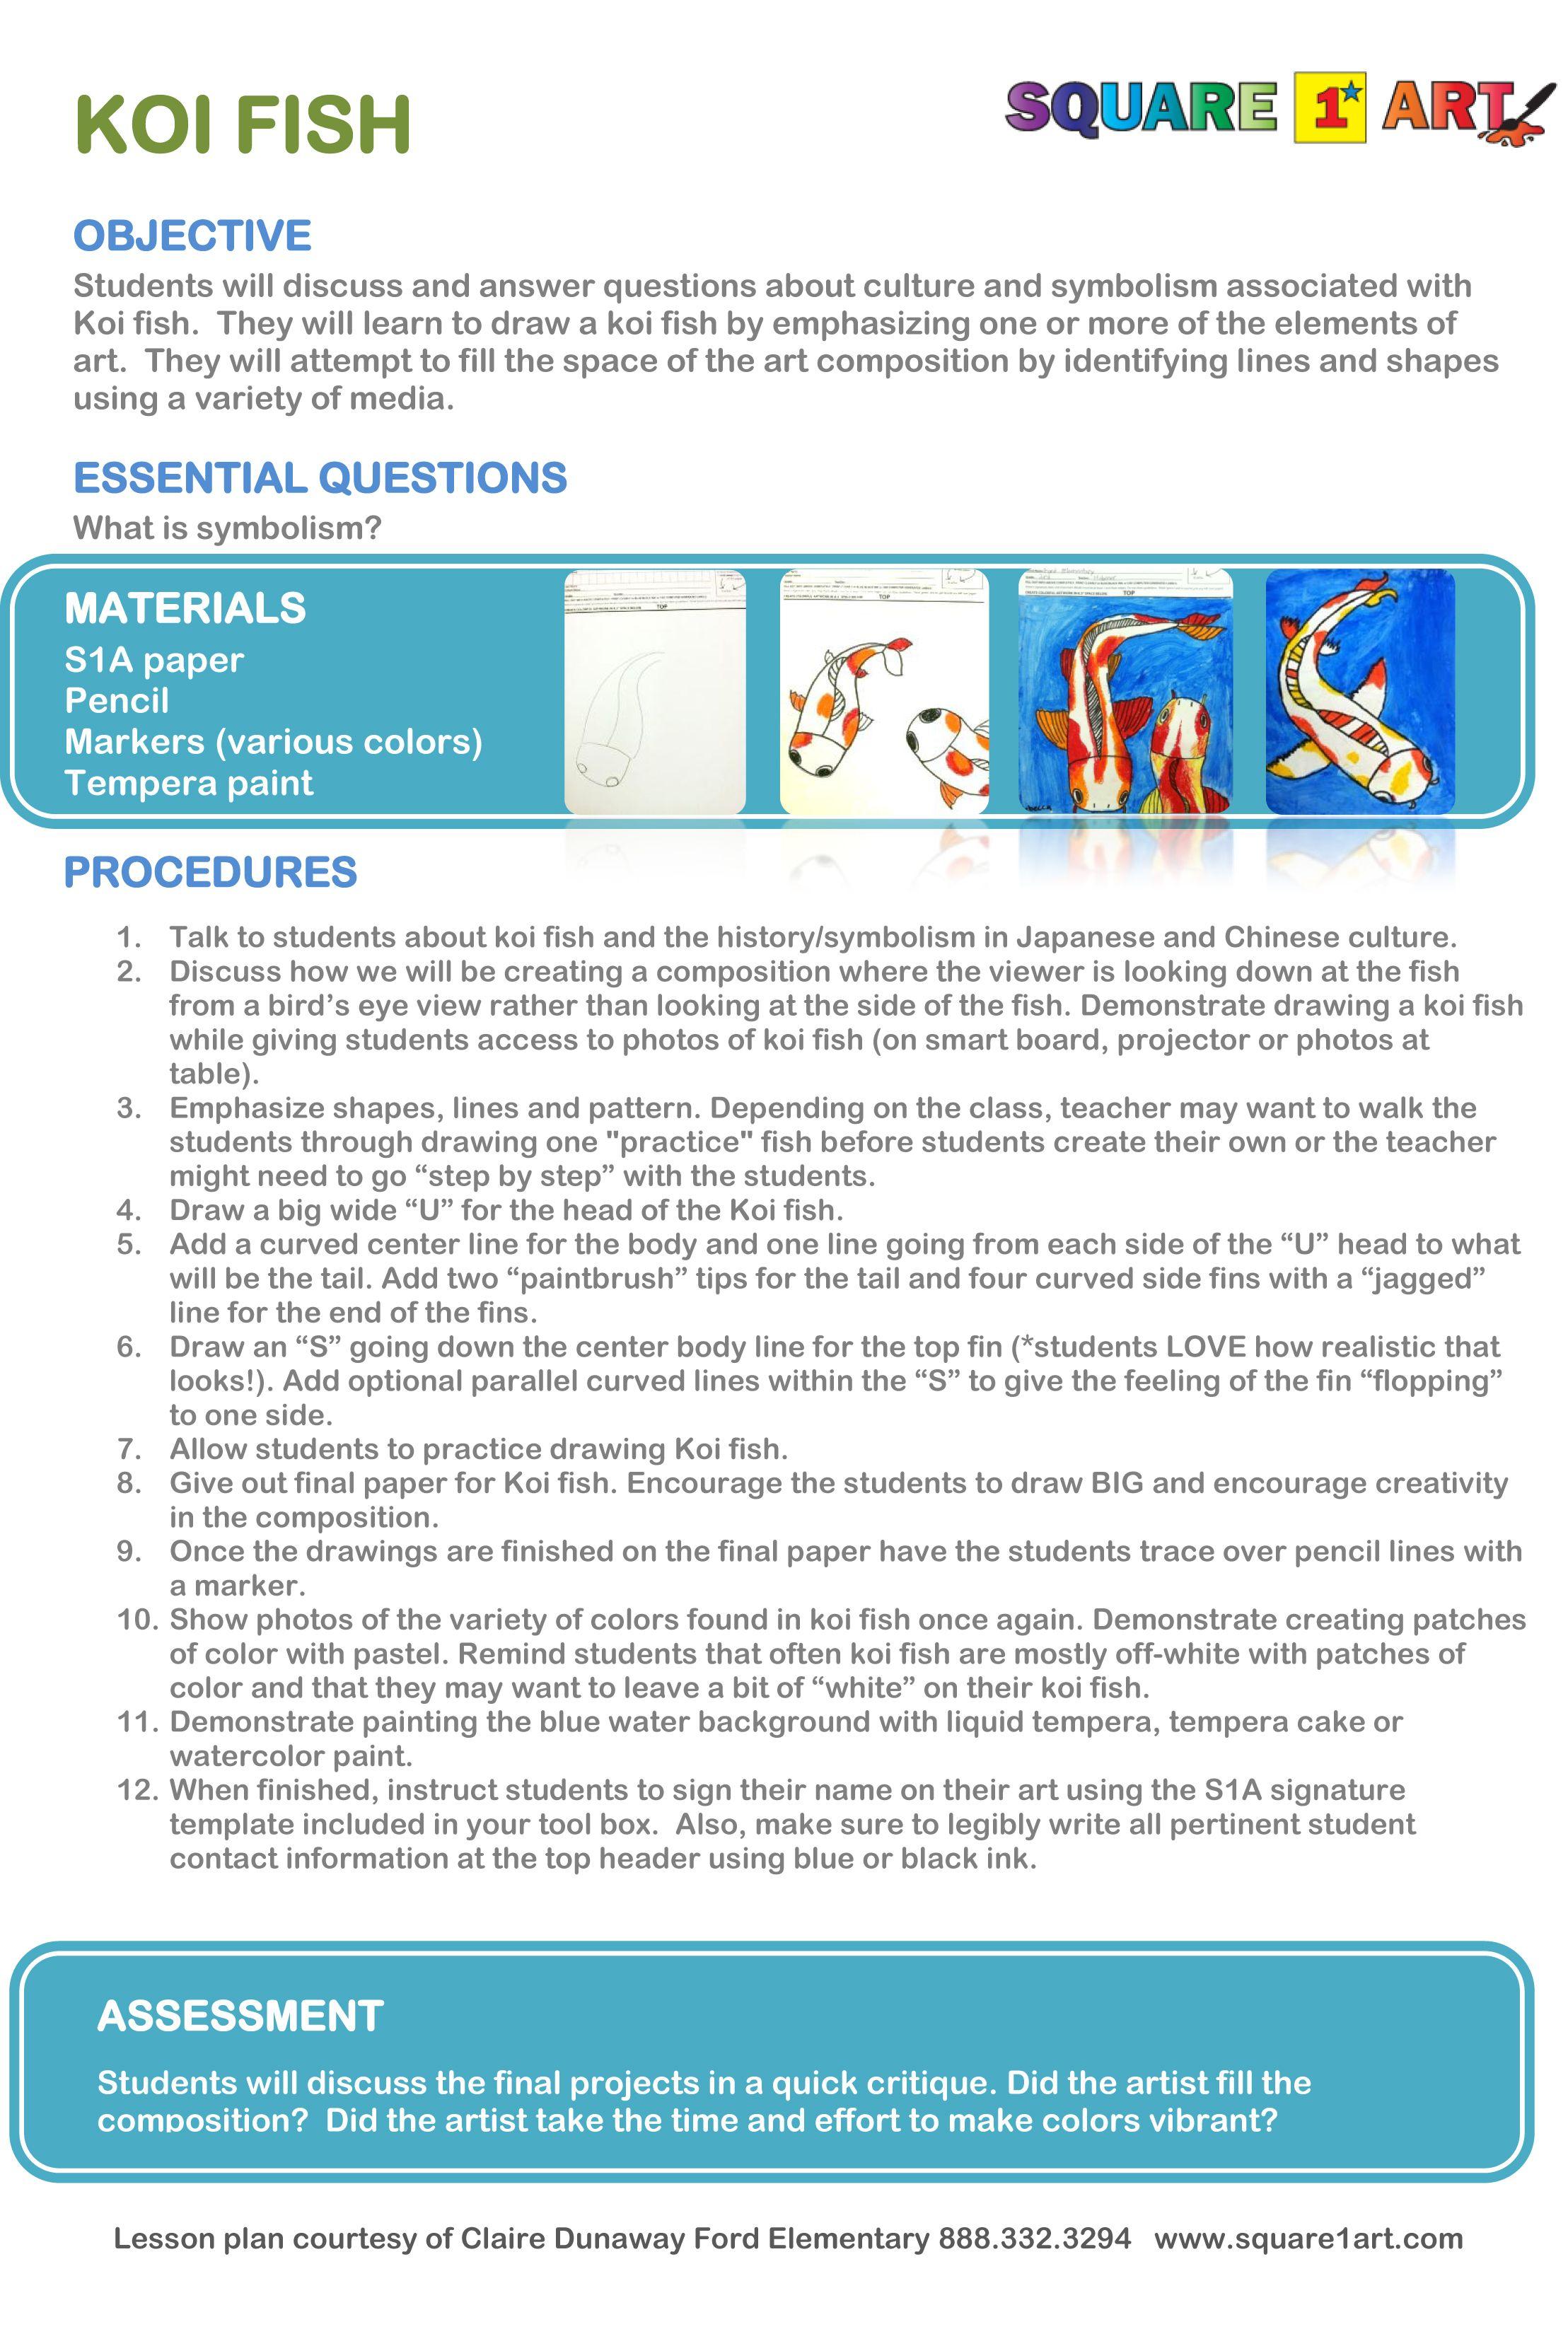 Koi Fish Lesson Plan Square1art In